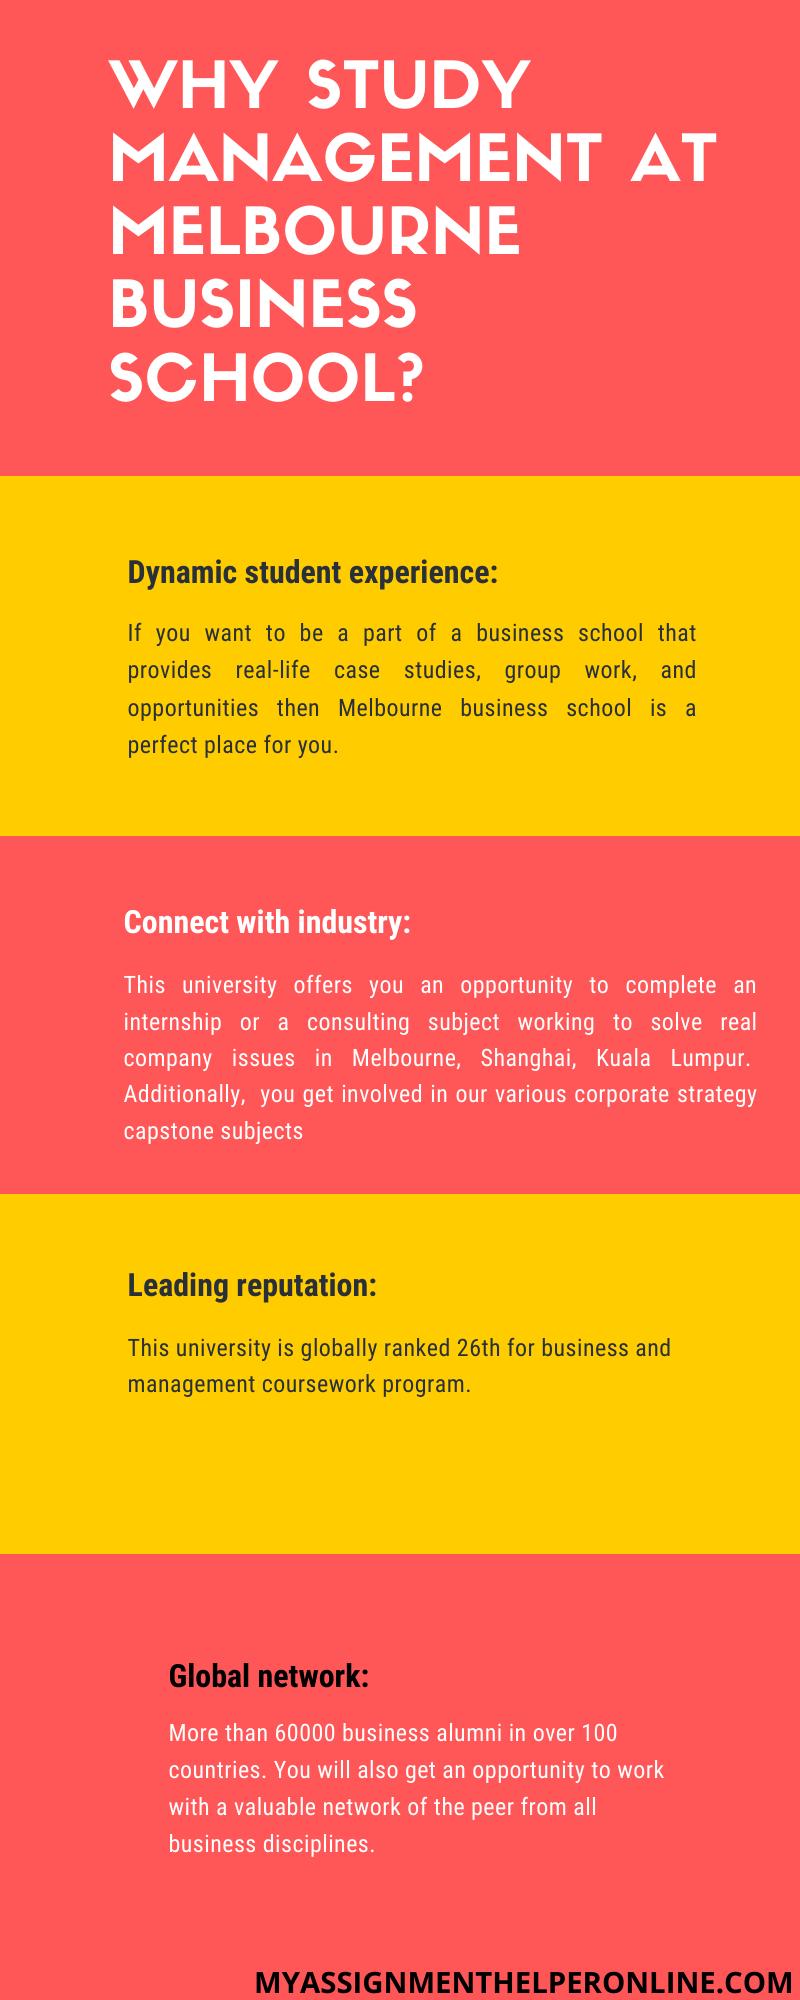 Melbourne-business-school